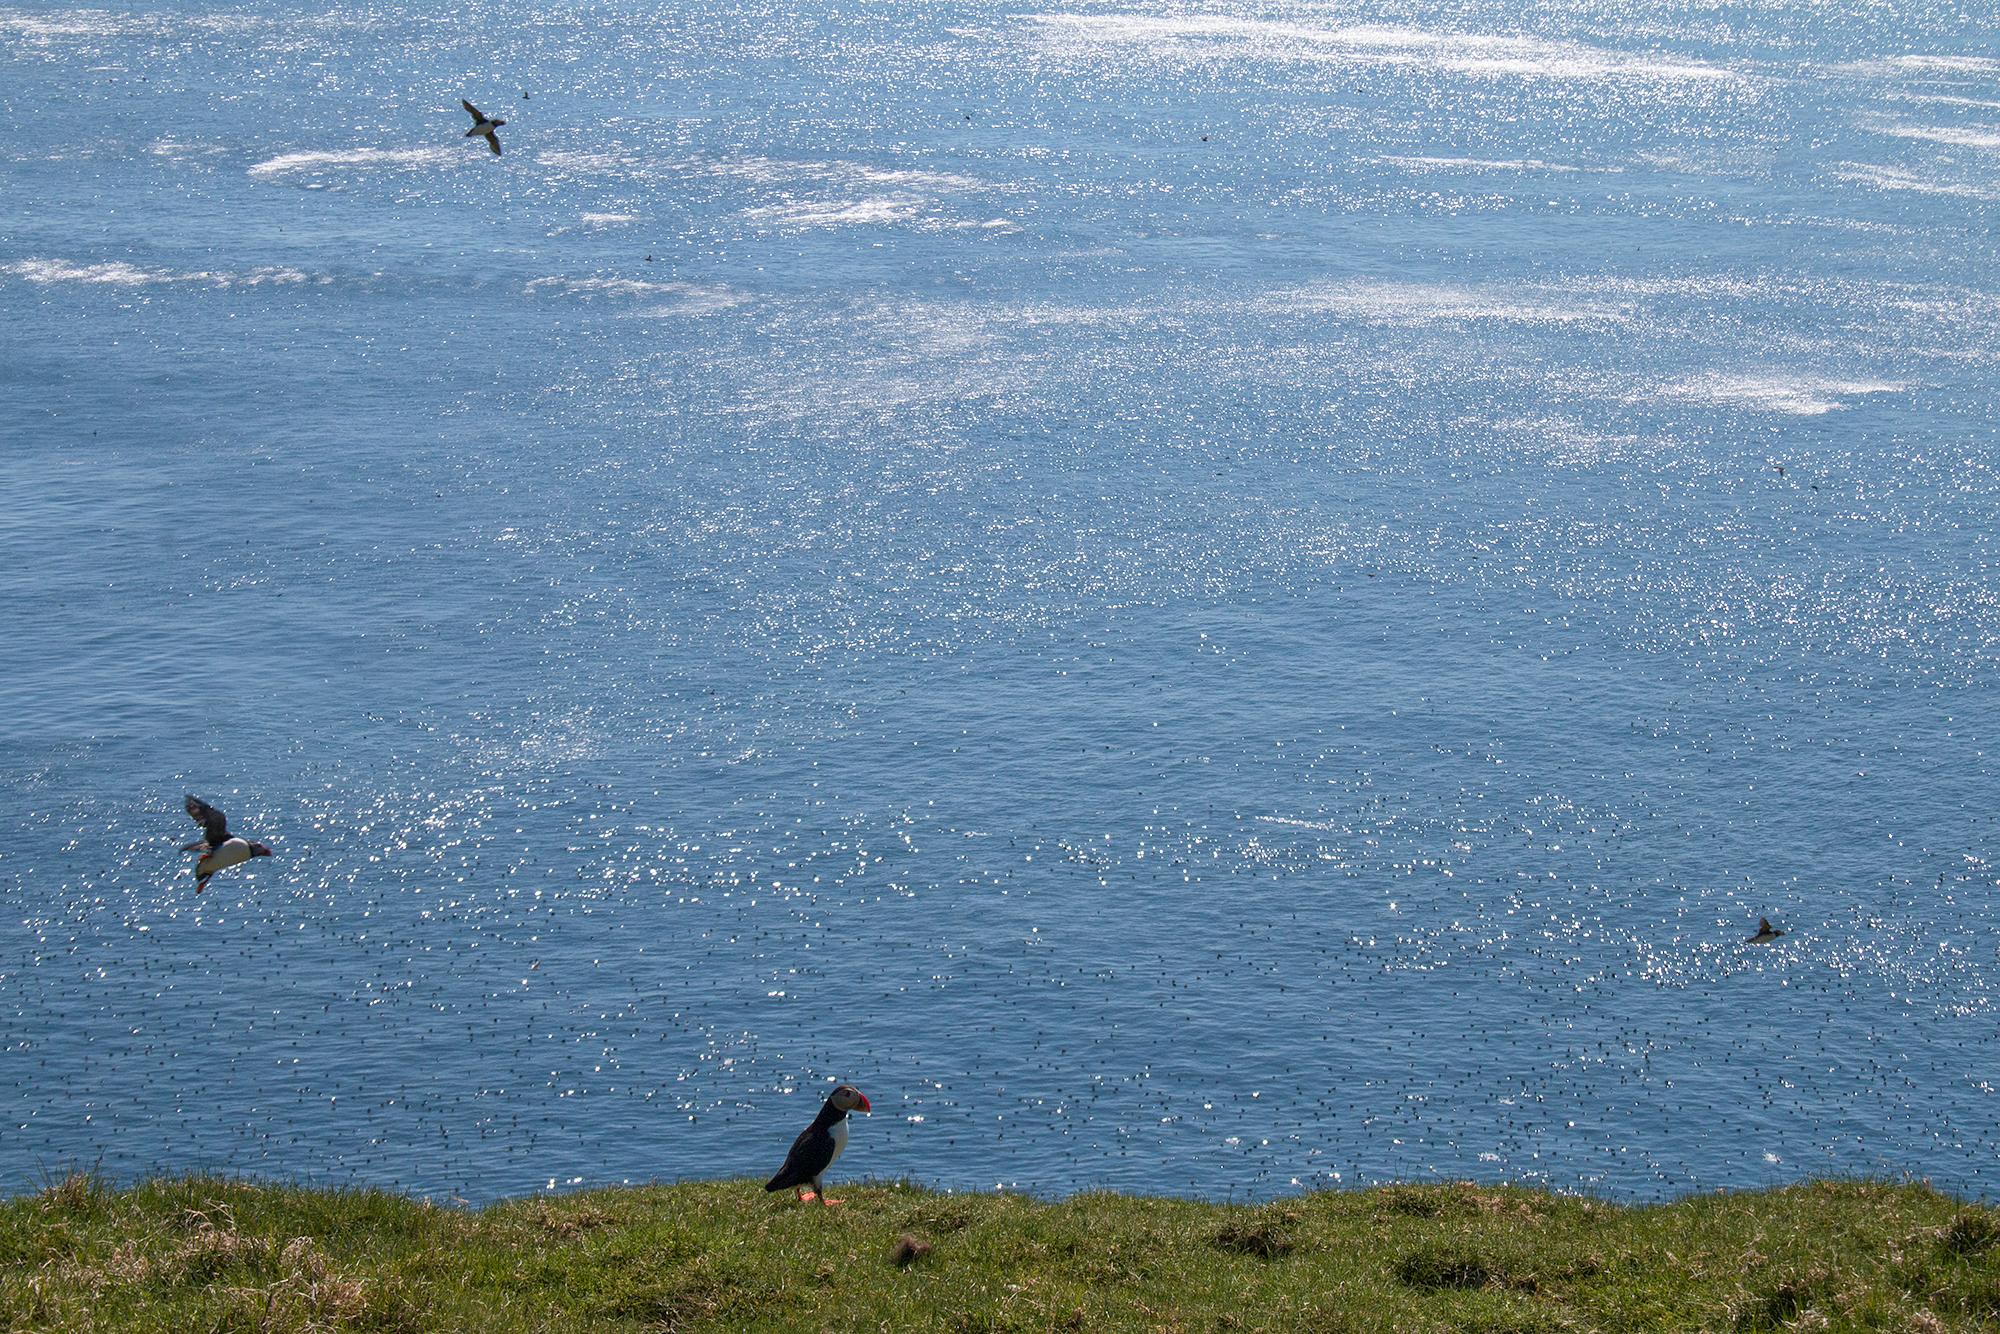 Lunnefågel-JPEG_web 5.jpg